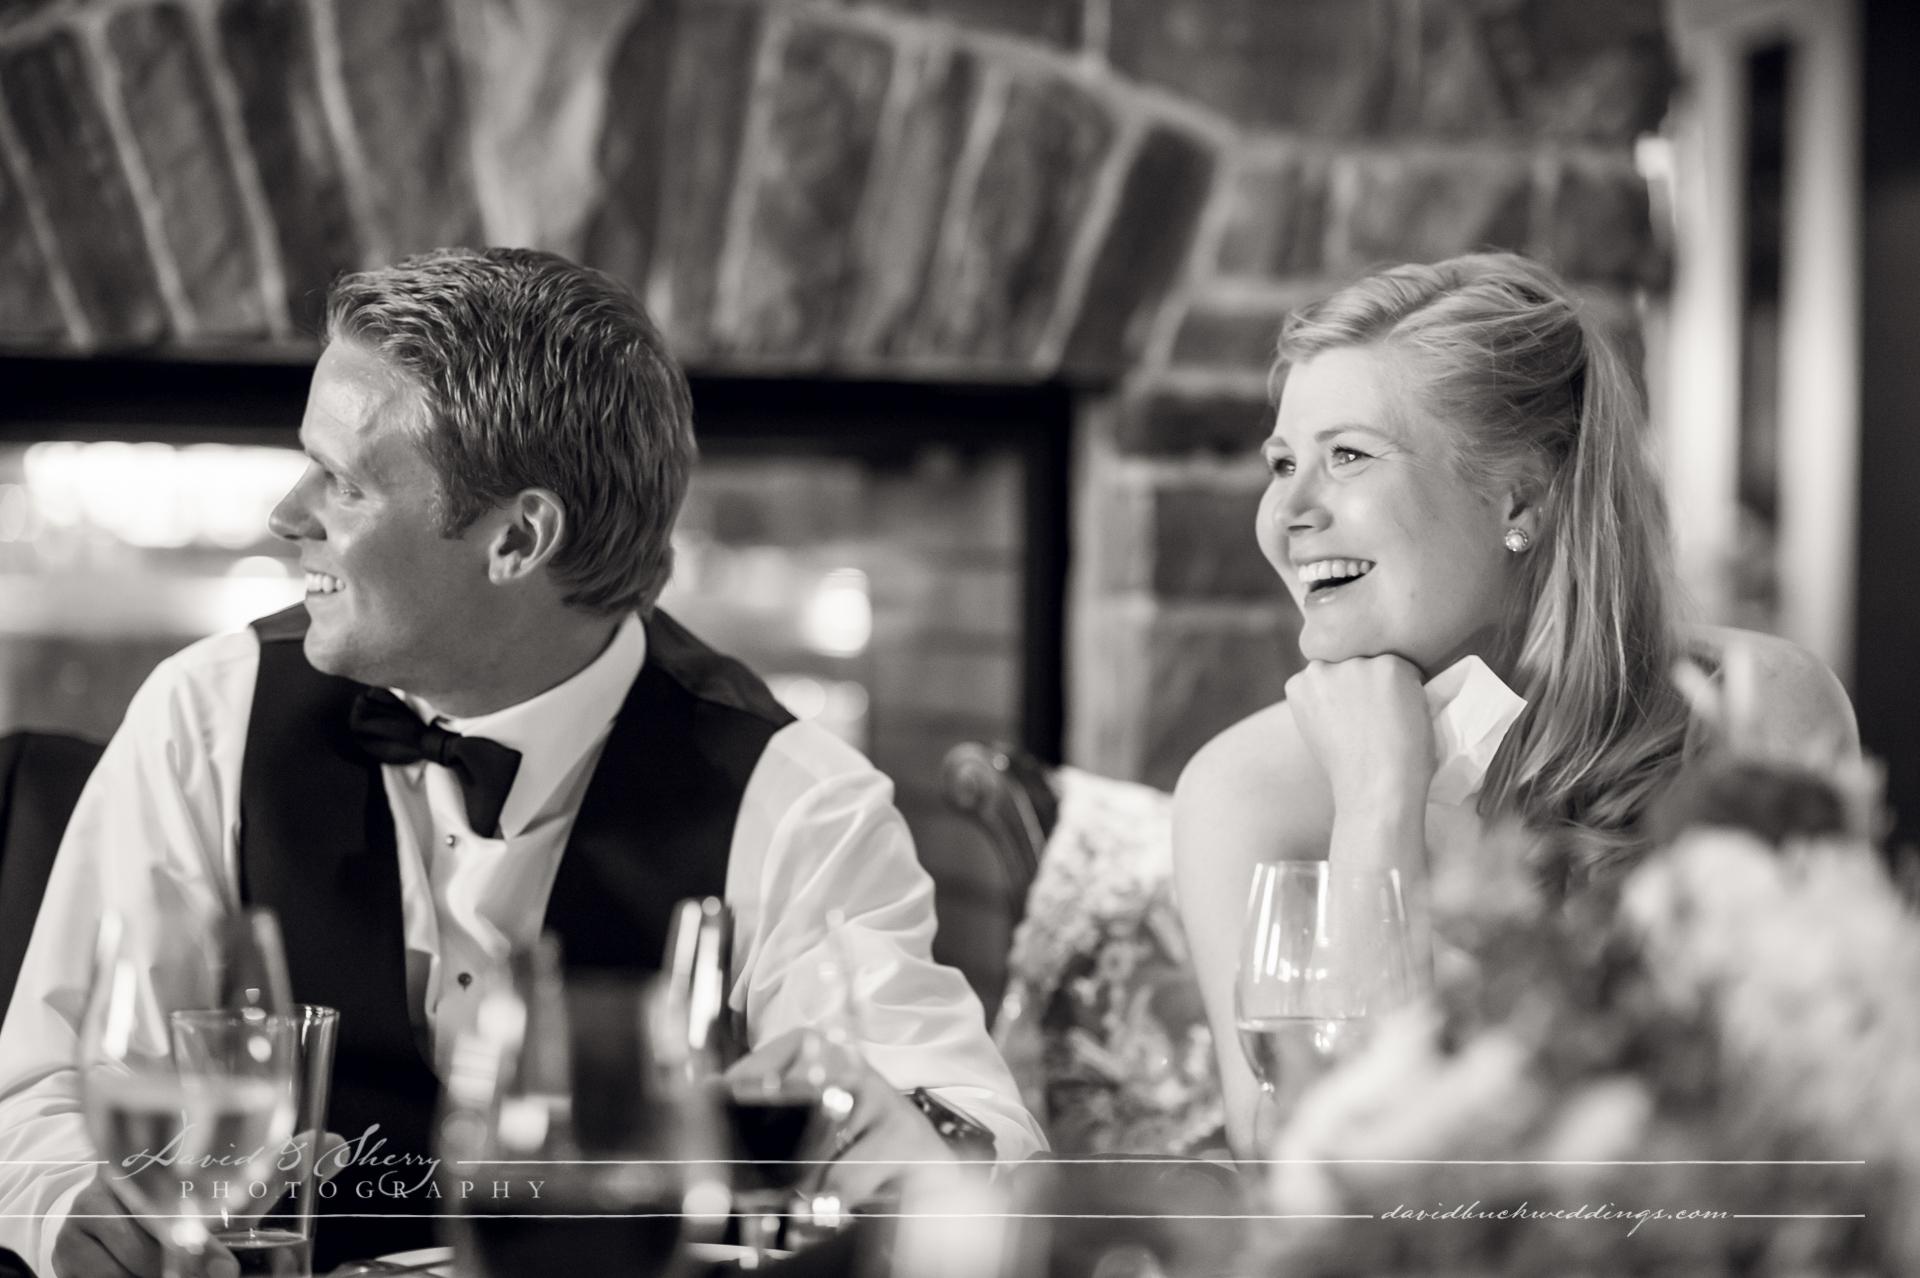 Cobble_Beach_Wedding_Photography_31